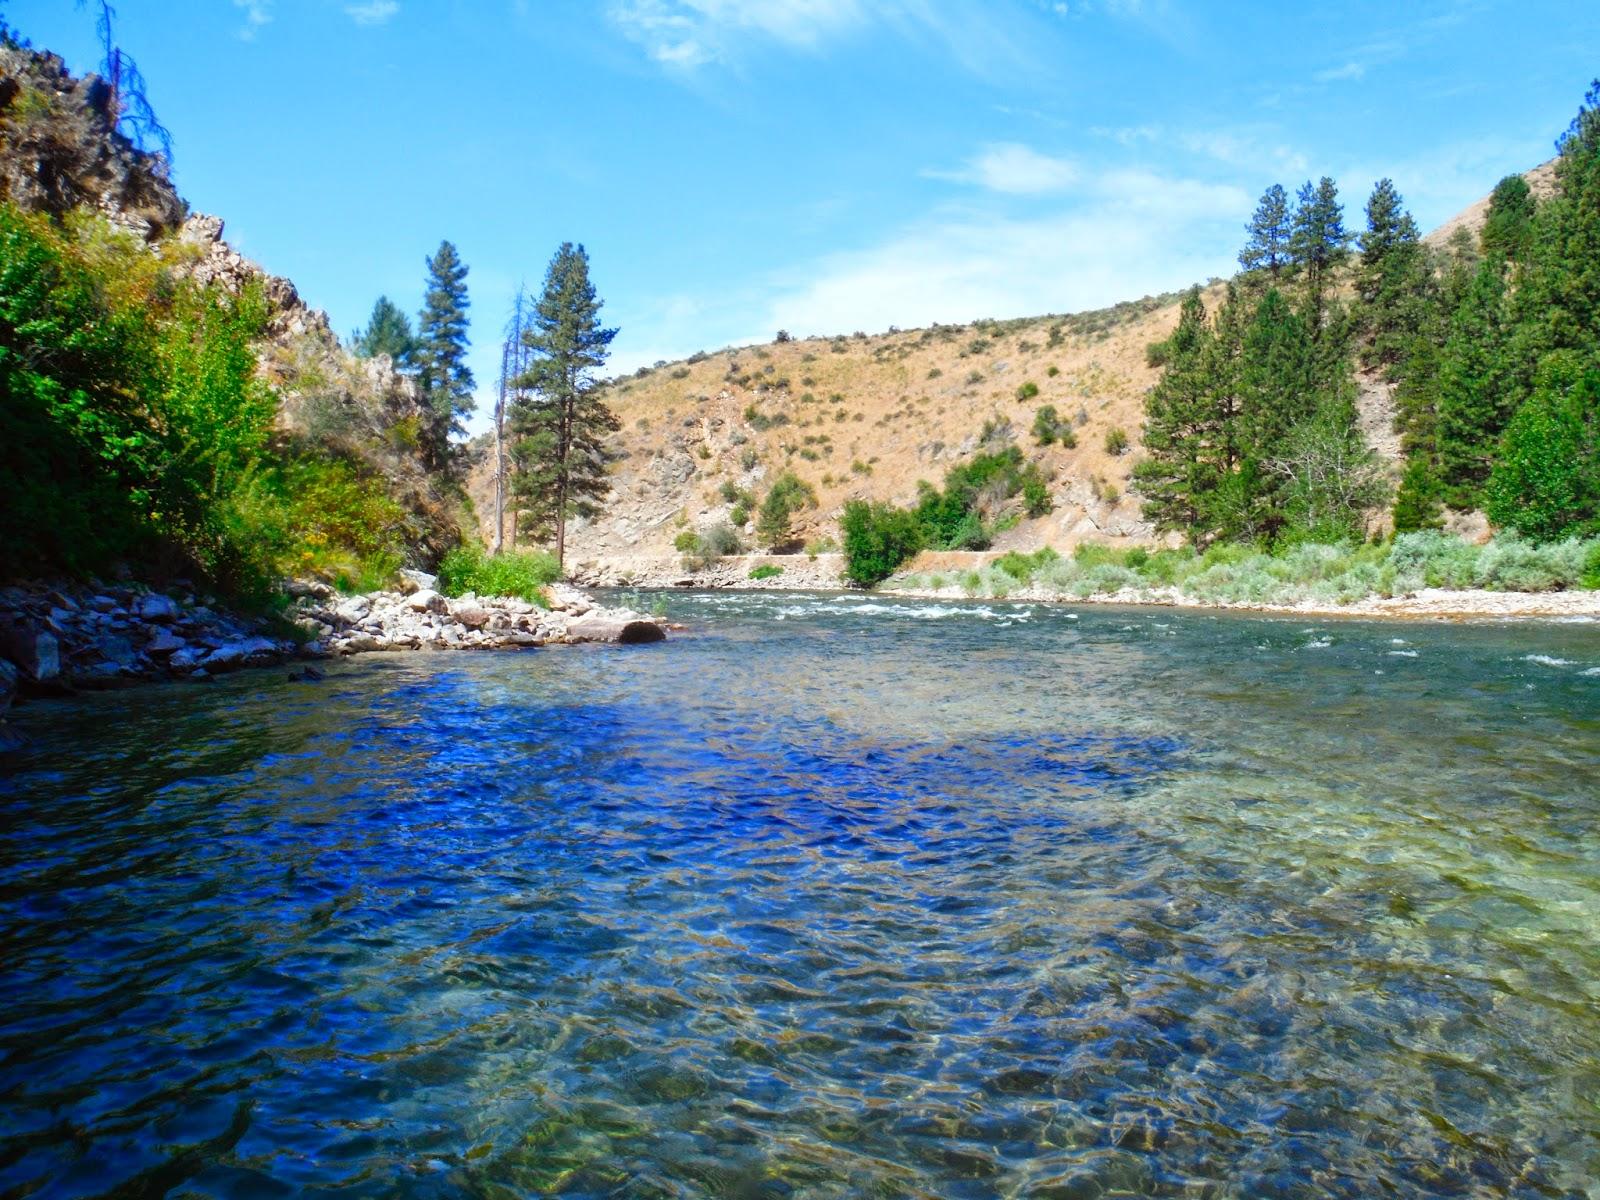 Erik s fly fishing blog july 2014 for Boise river fishing